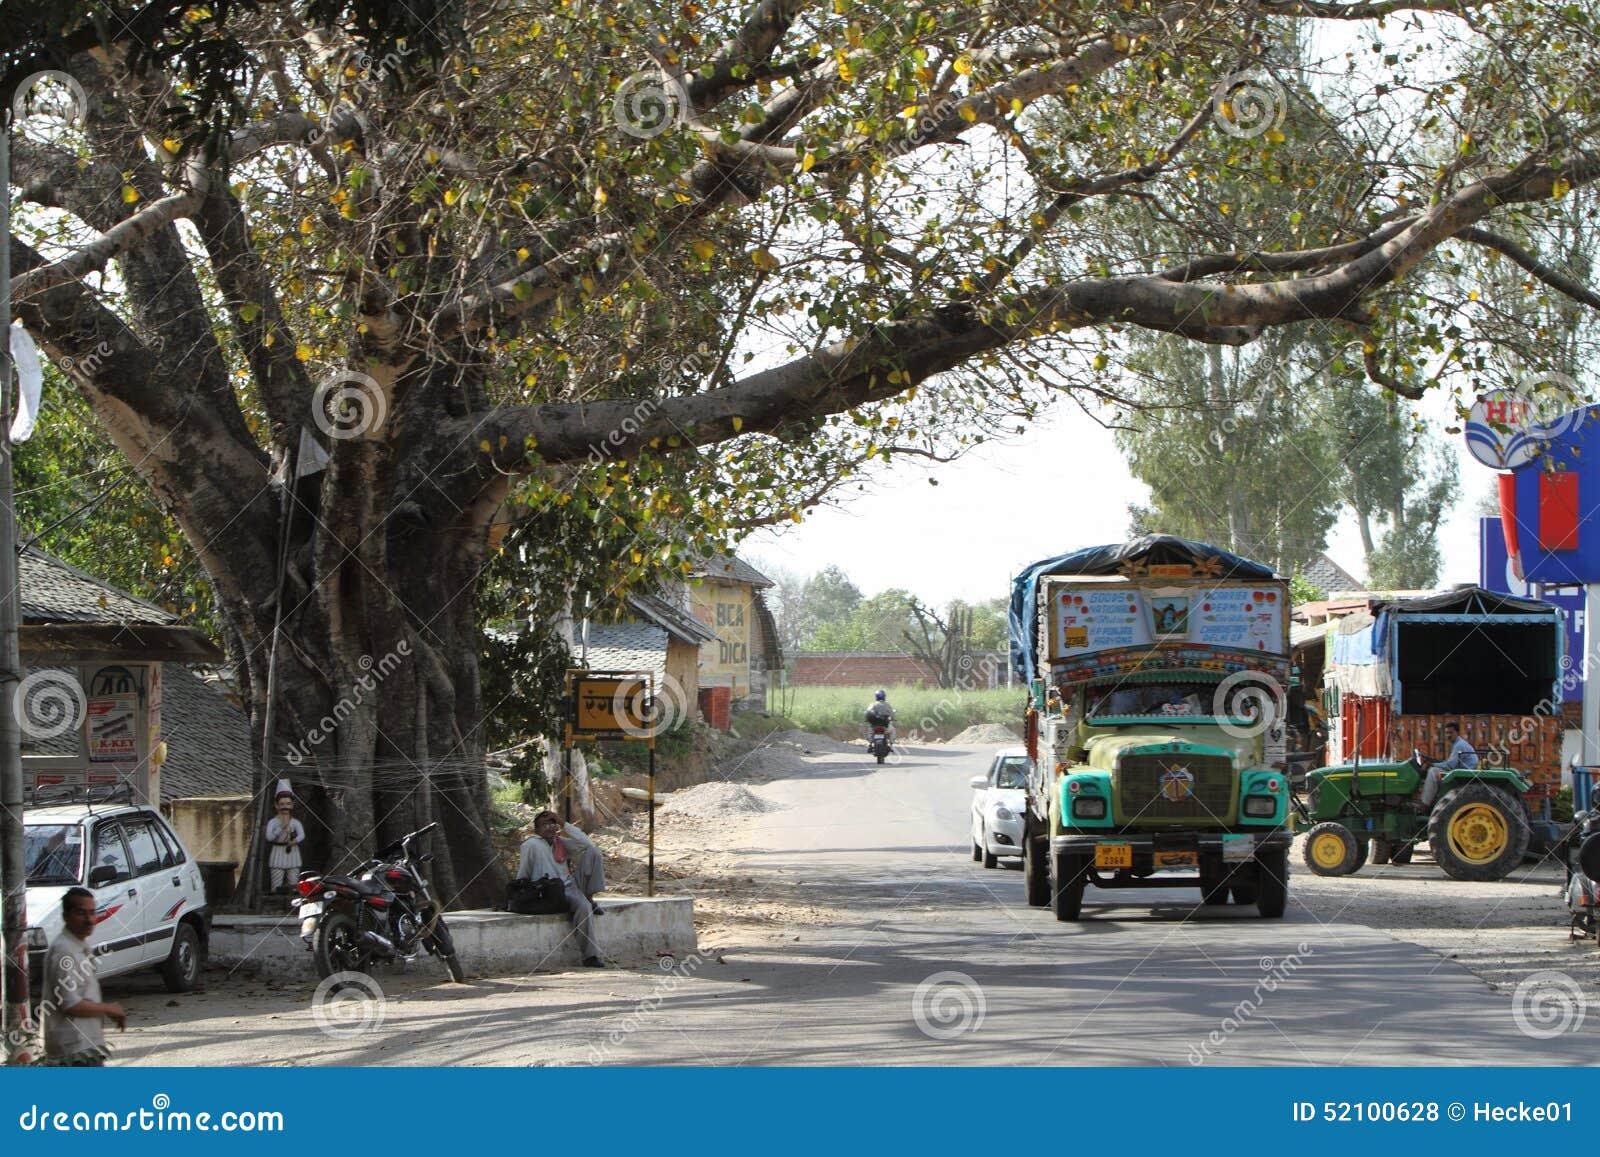 Public Transportation In India Editorial Stock Photo - Image